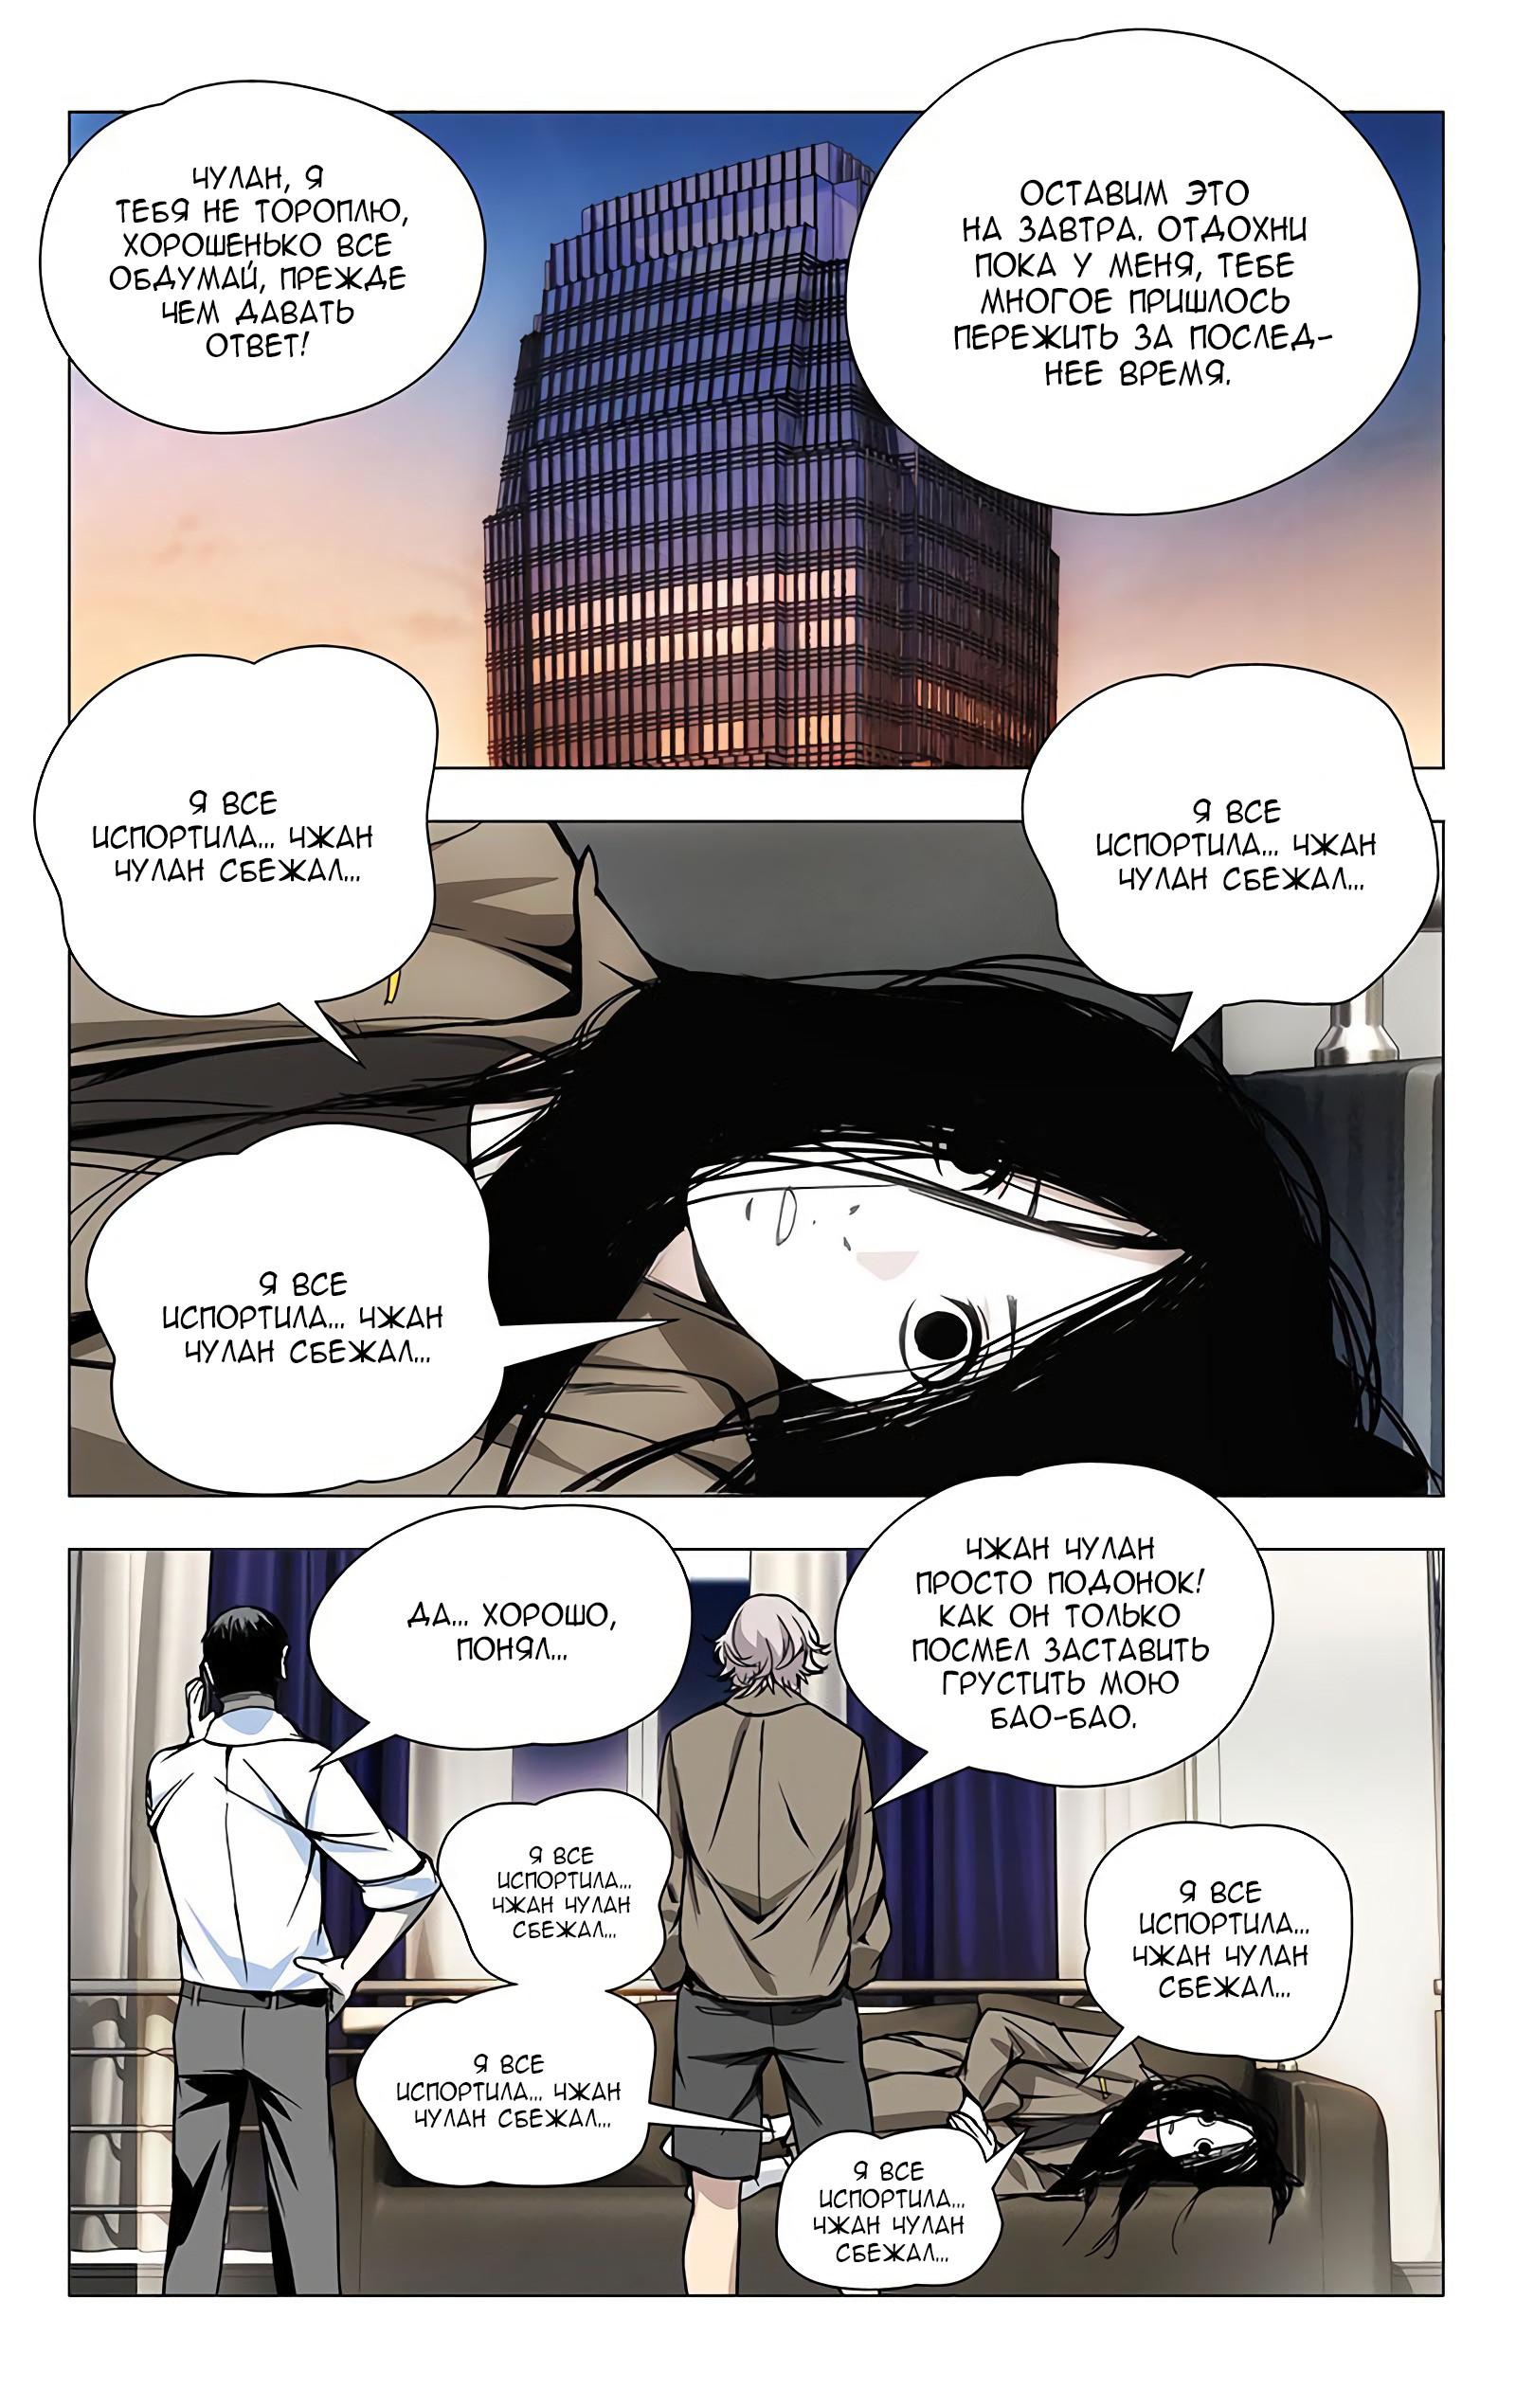 https://r1.ninemanga.com/comics/pic2/39/27047/437149/1537310410125.jpg Page 1